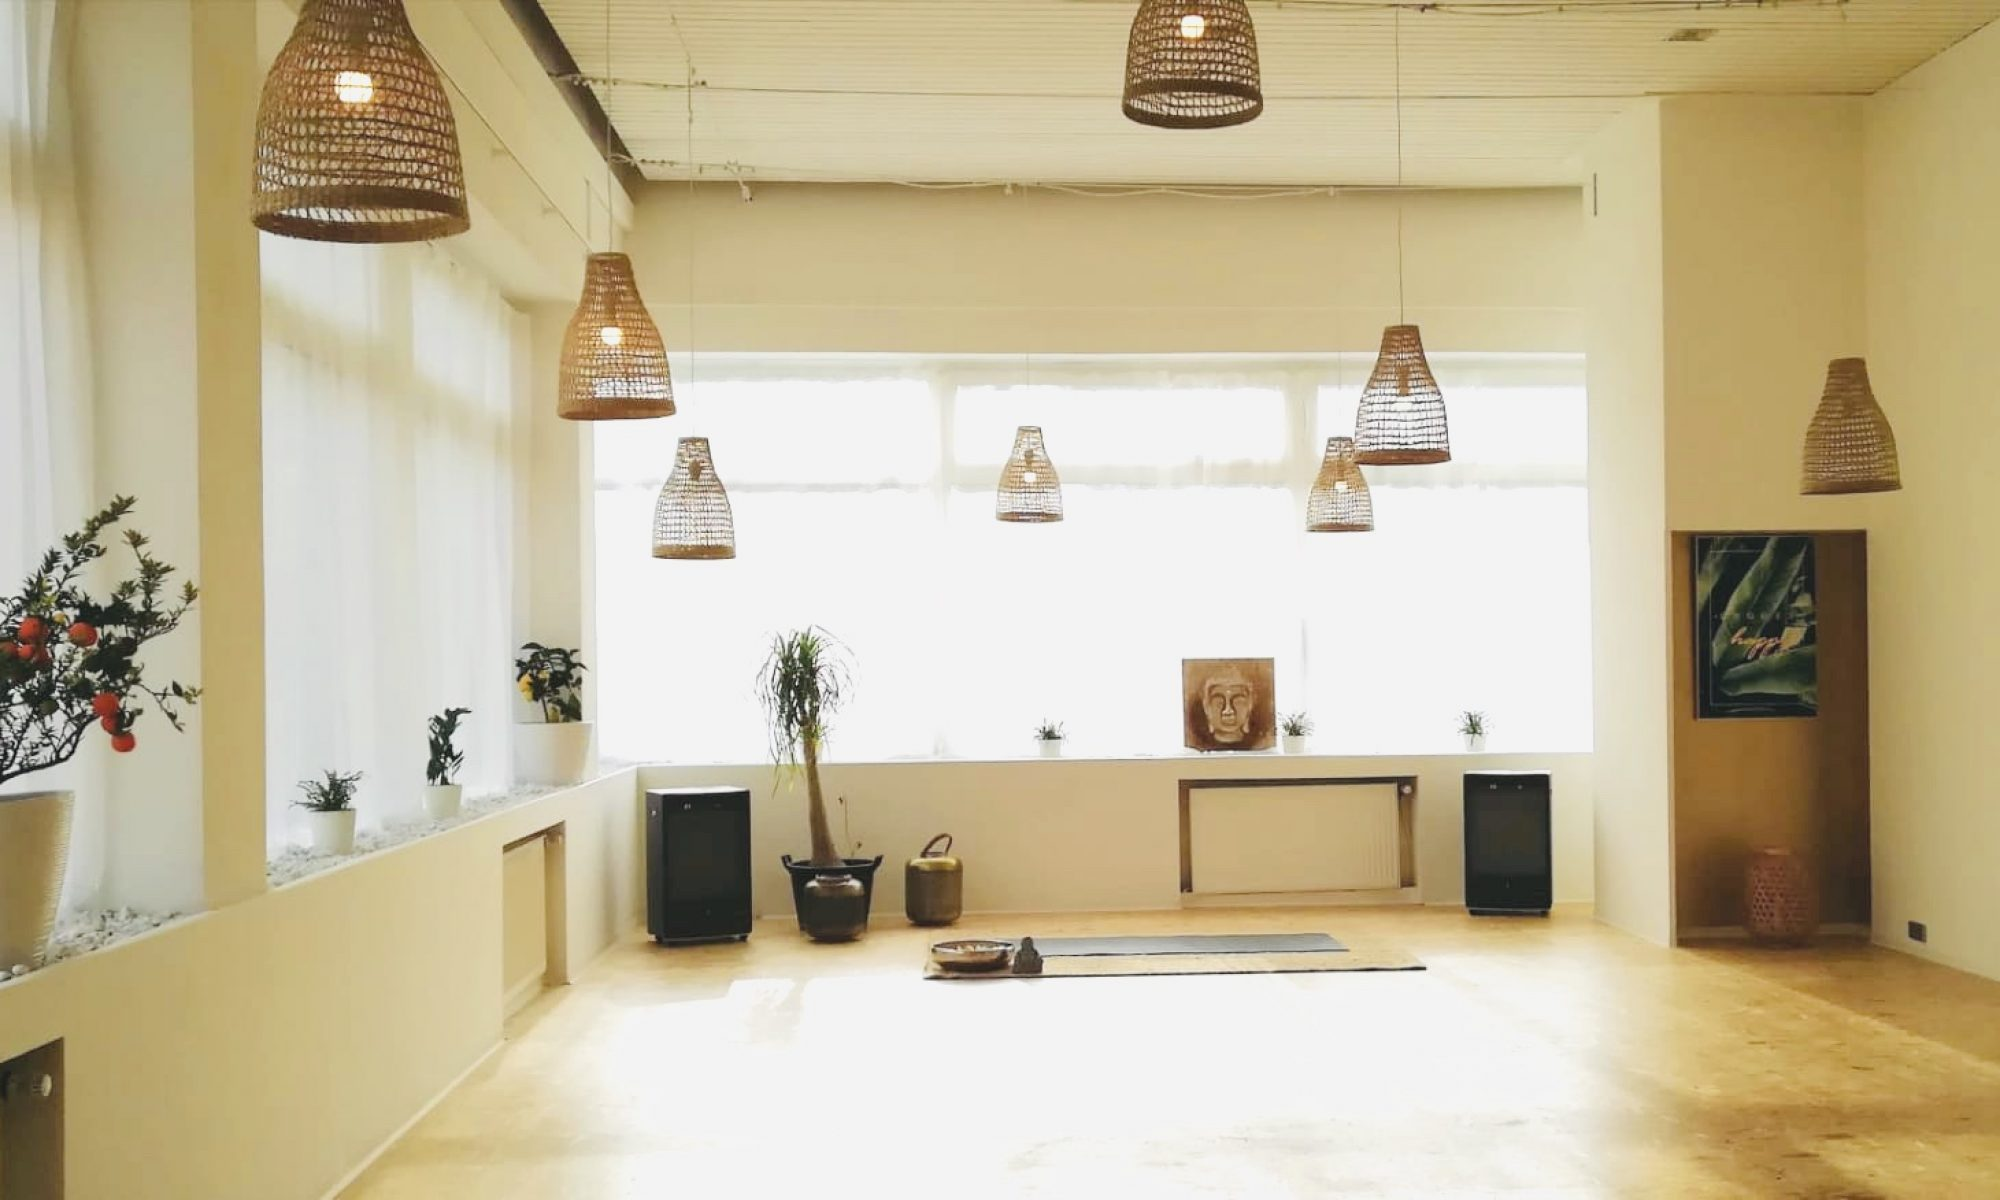 Studio 108 - Yoga. Wellness. Lifestyle.